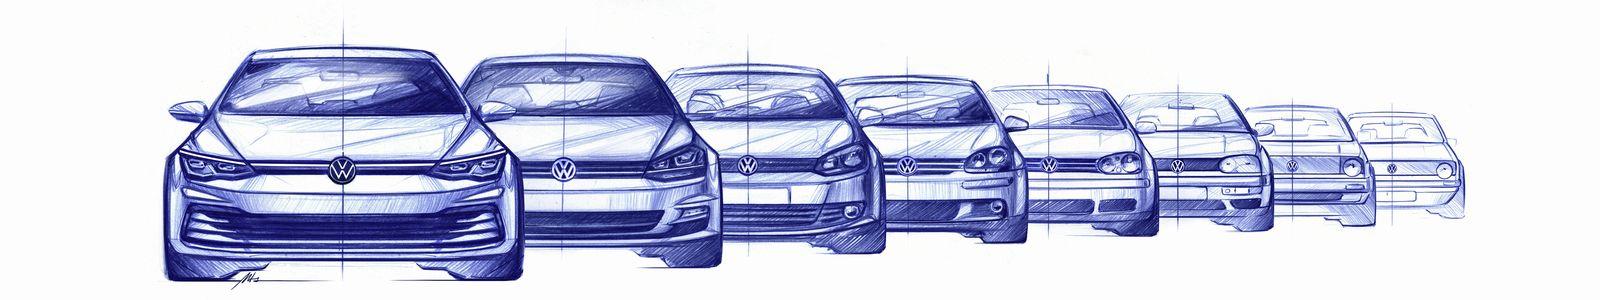 Nouvelle Golf 8 Volkswagen